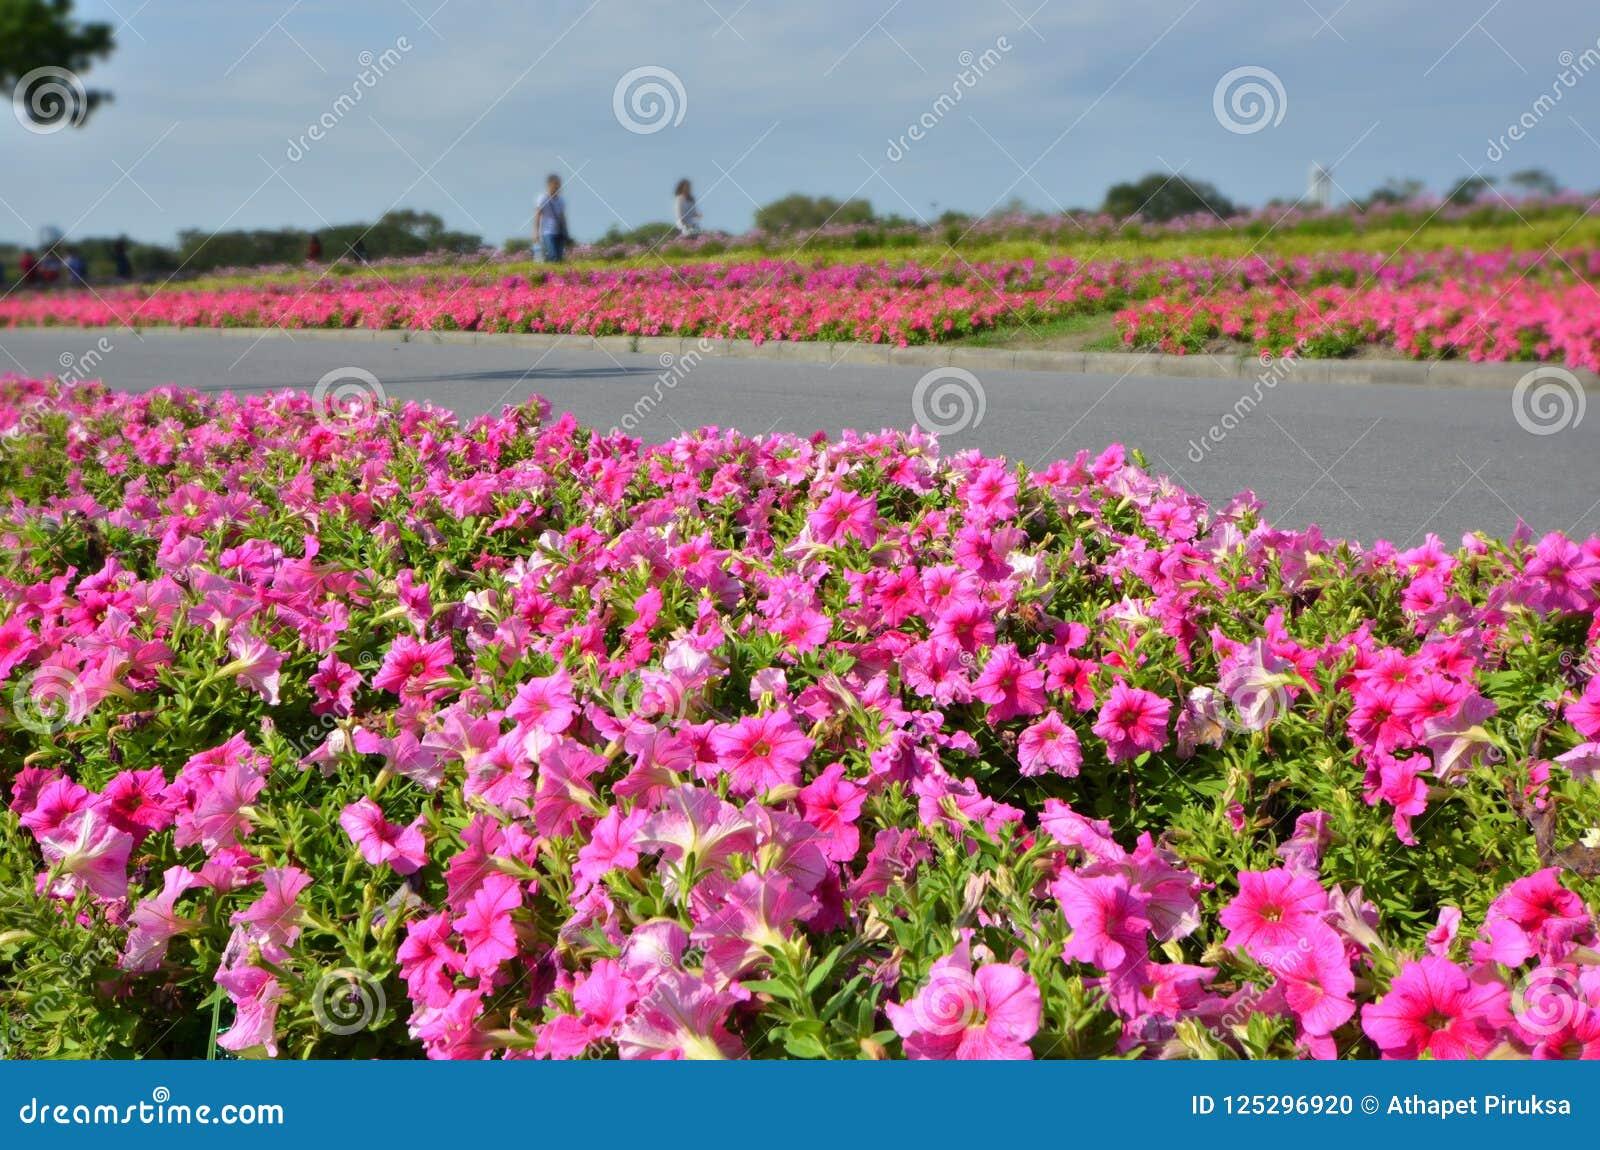 Pink morning glory flower garden in the park